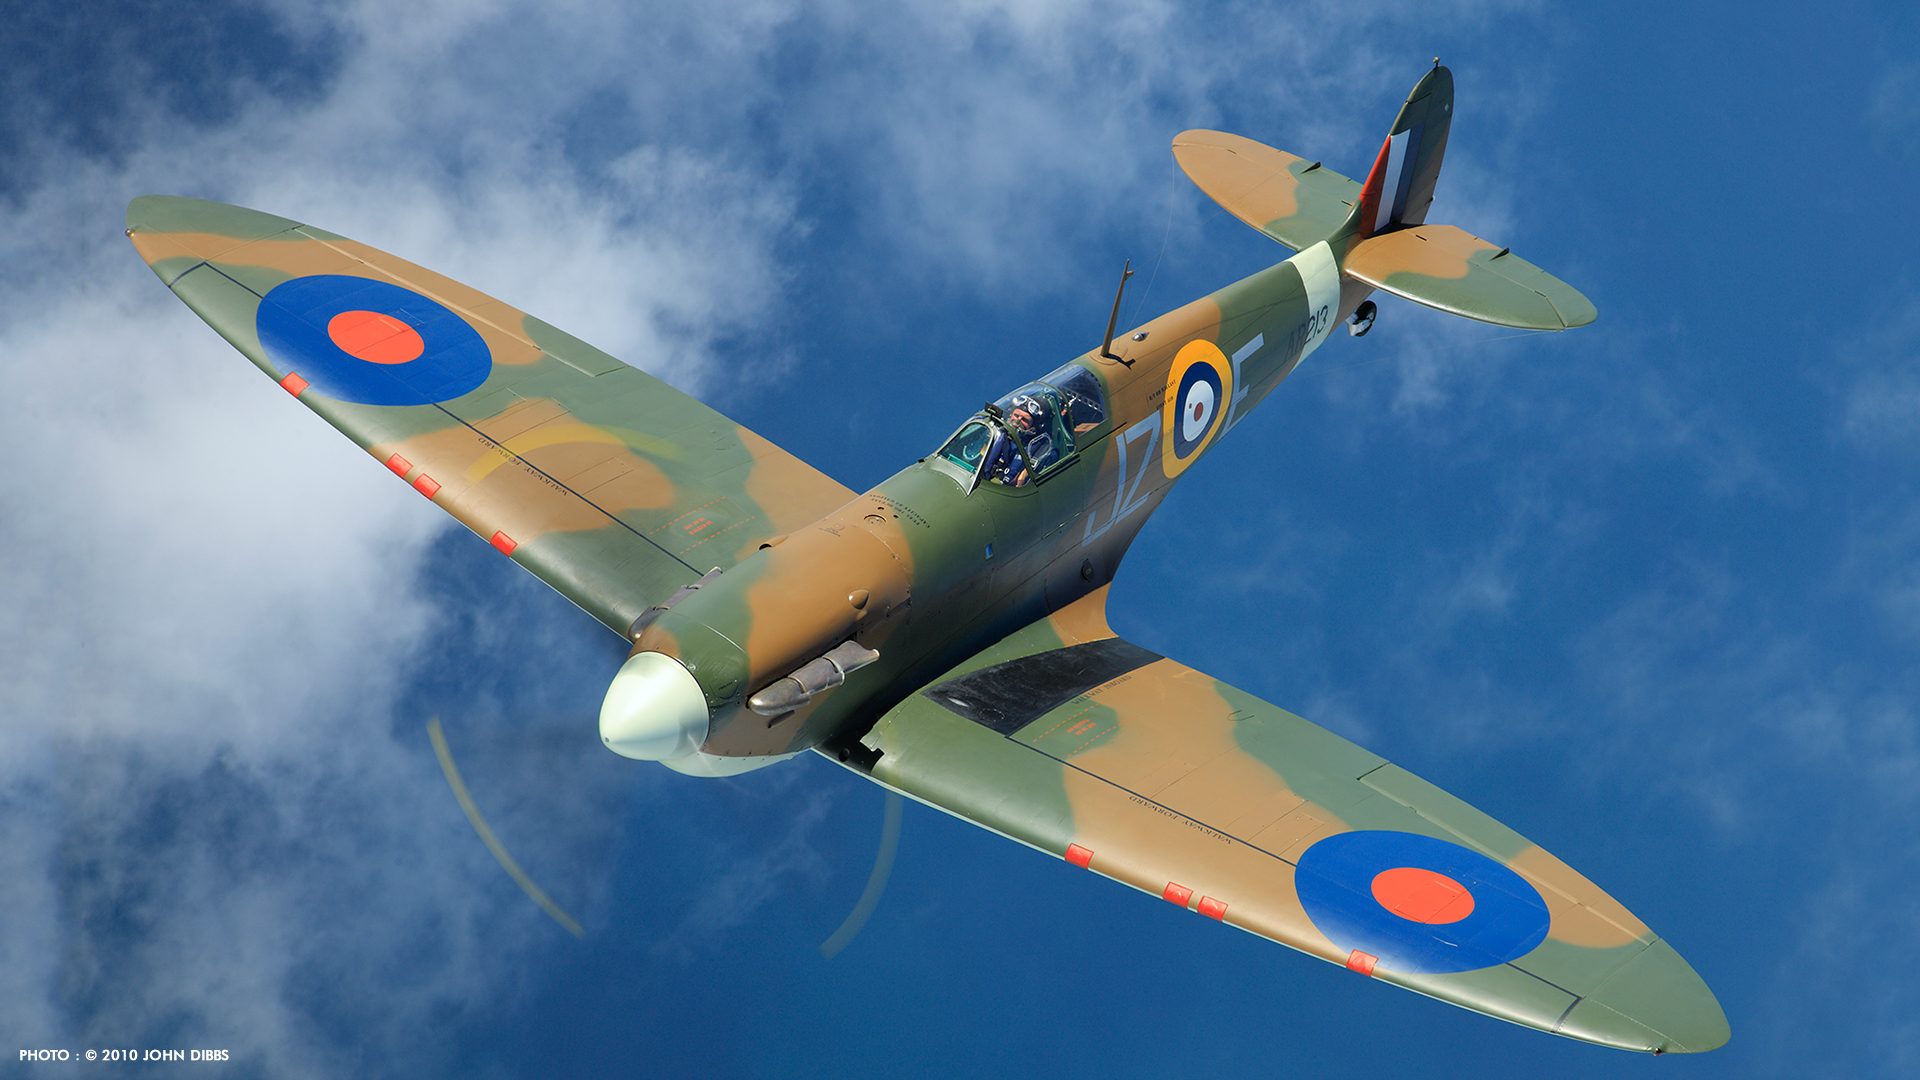 Spitfire Wallpaper HD - WallpaperSafari